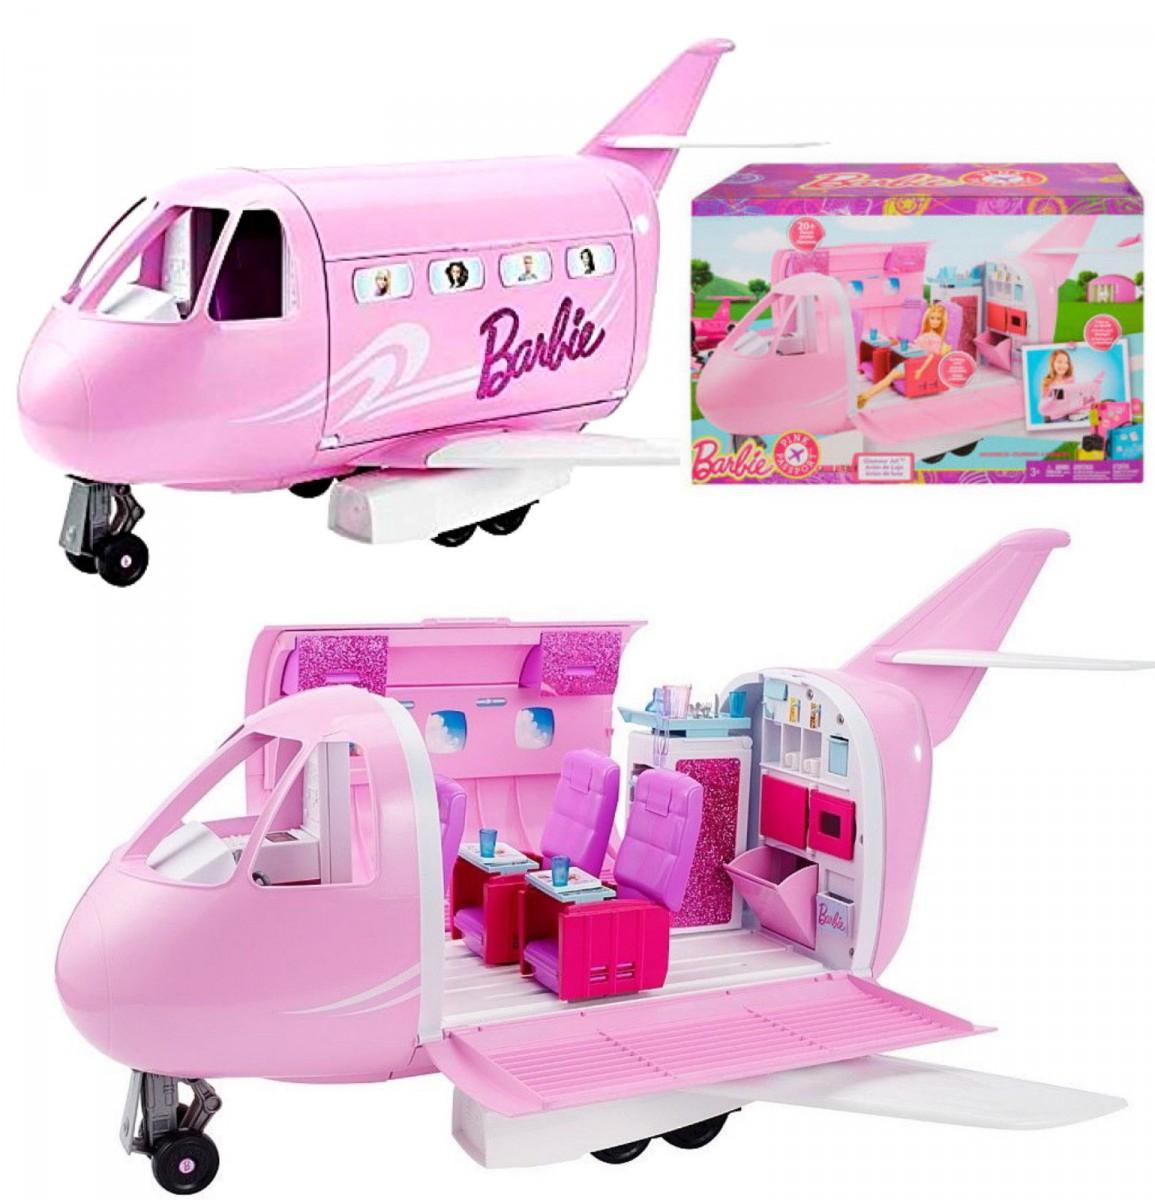 Barbie repülőgép DMR53 d2681c1f67